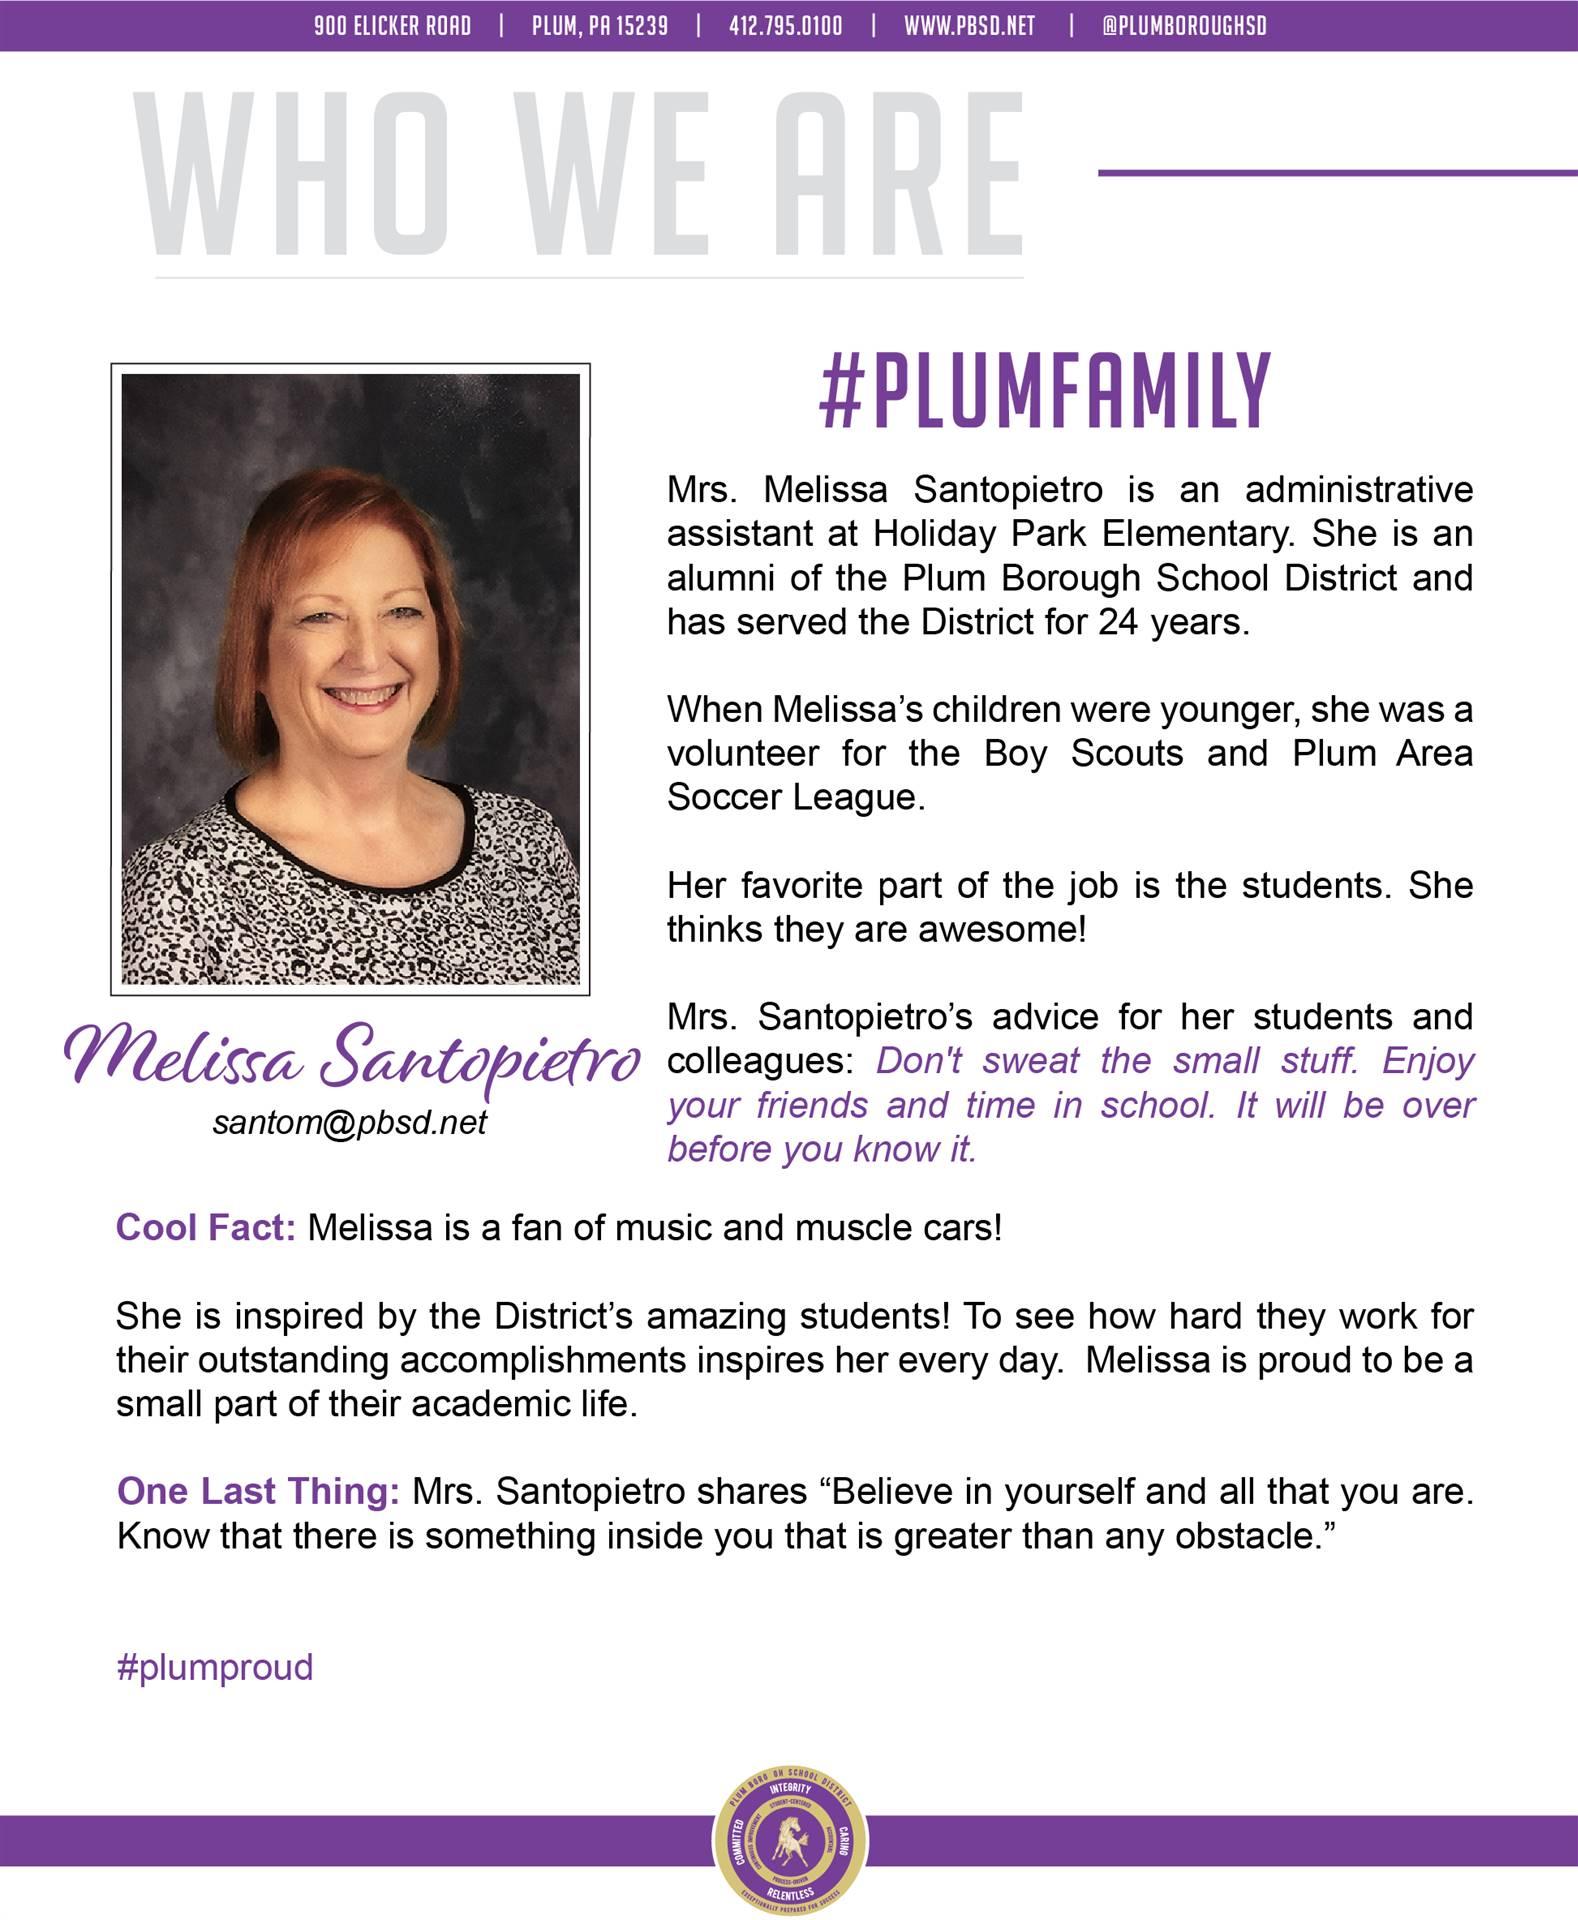 Who We Are Wednesday features Melissa Santopietro.